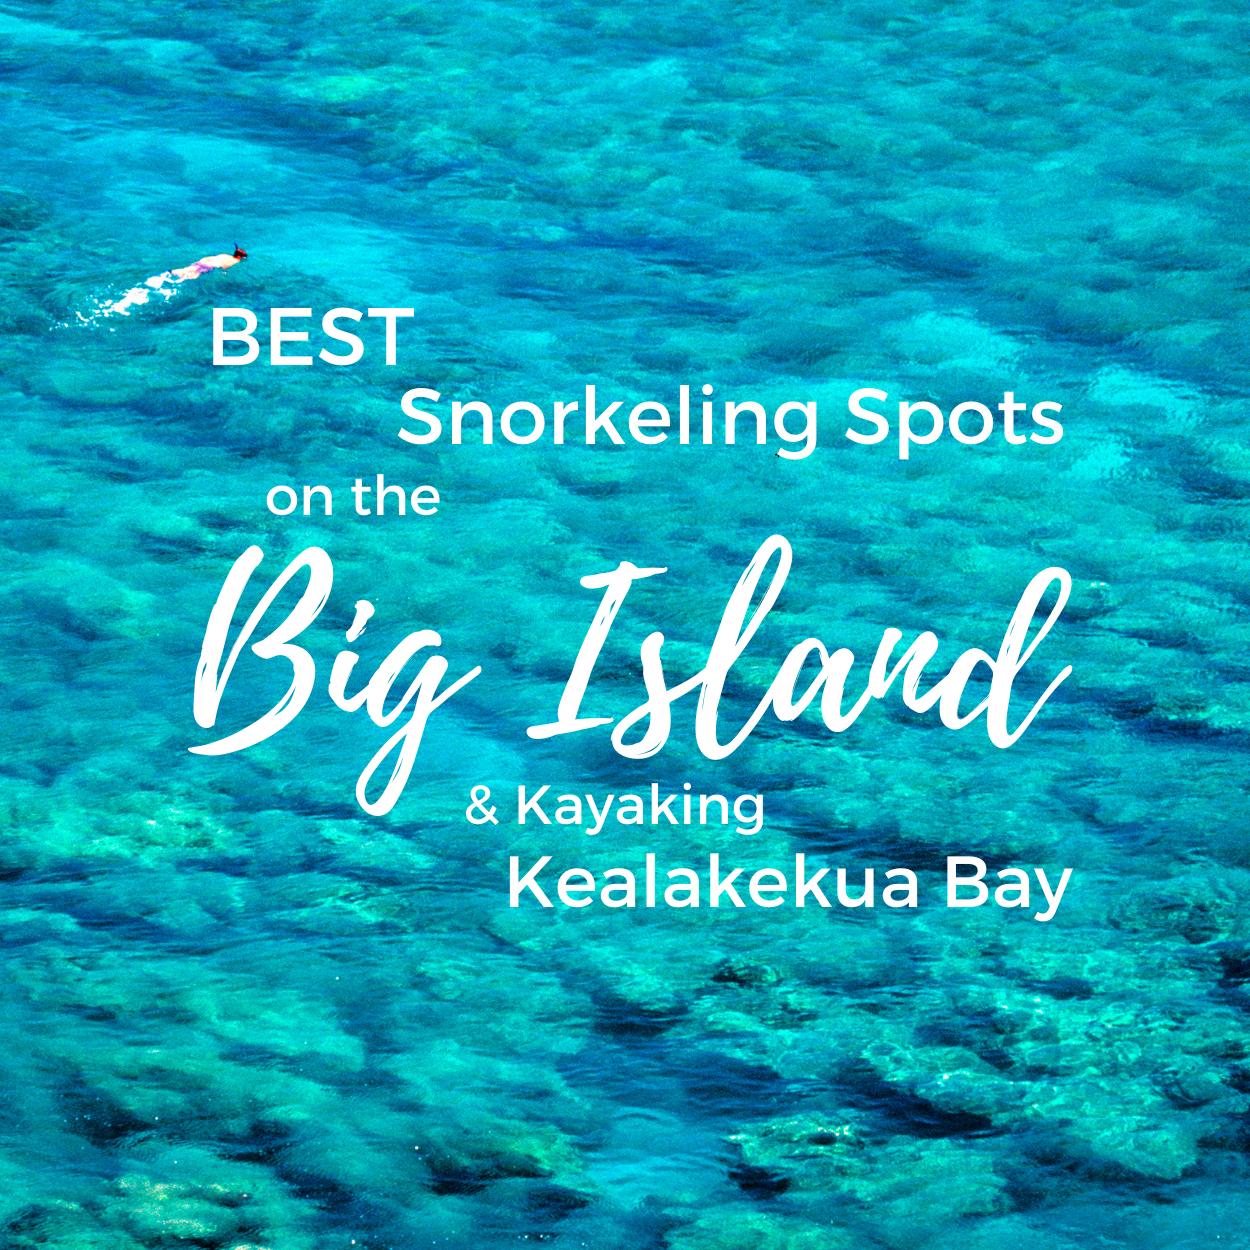 Best Big Island Snorkeling Spots (& Kayaking Kealakekua Bay)